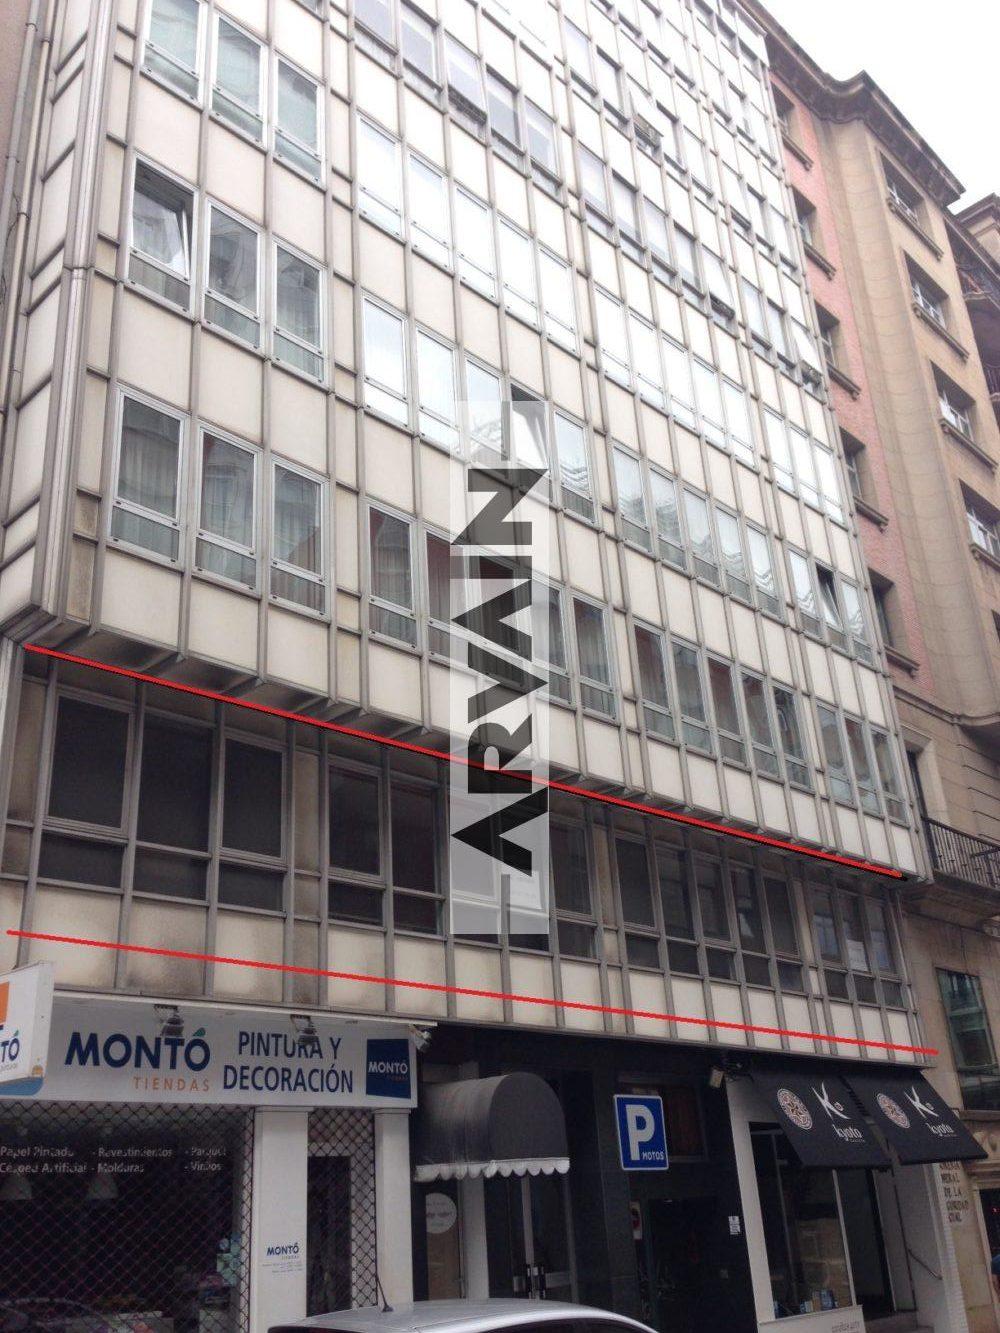 Local de oficinas plaza de vigo la coru a arvain servicios inmobilairios - Alquiler oficinas coruna ...